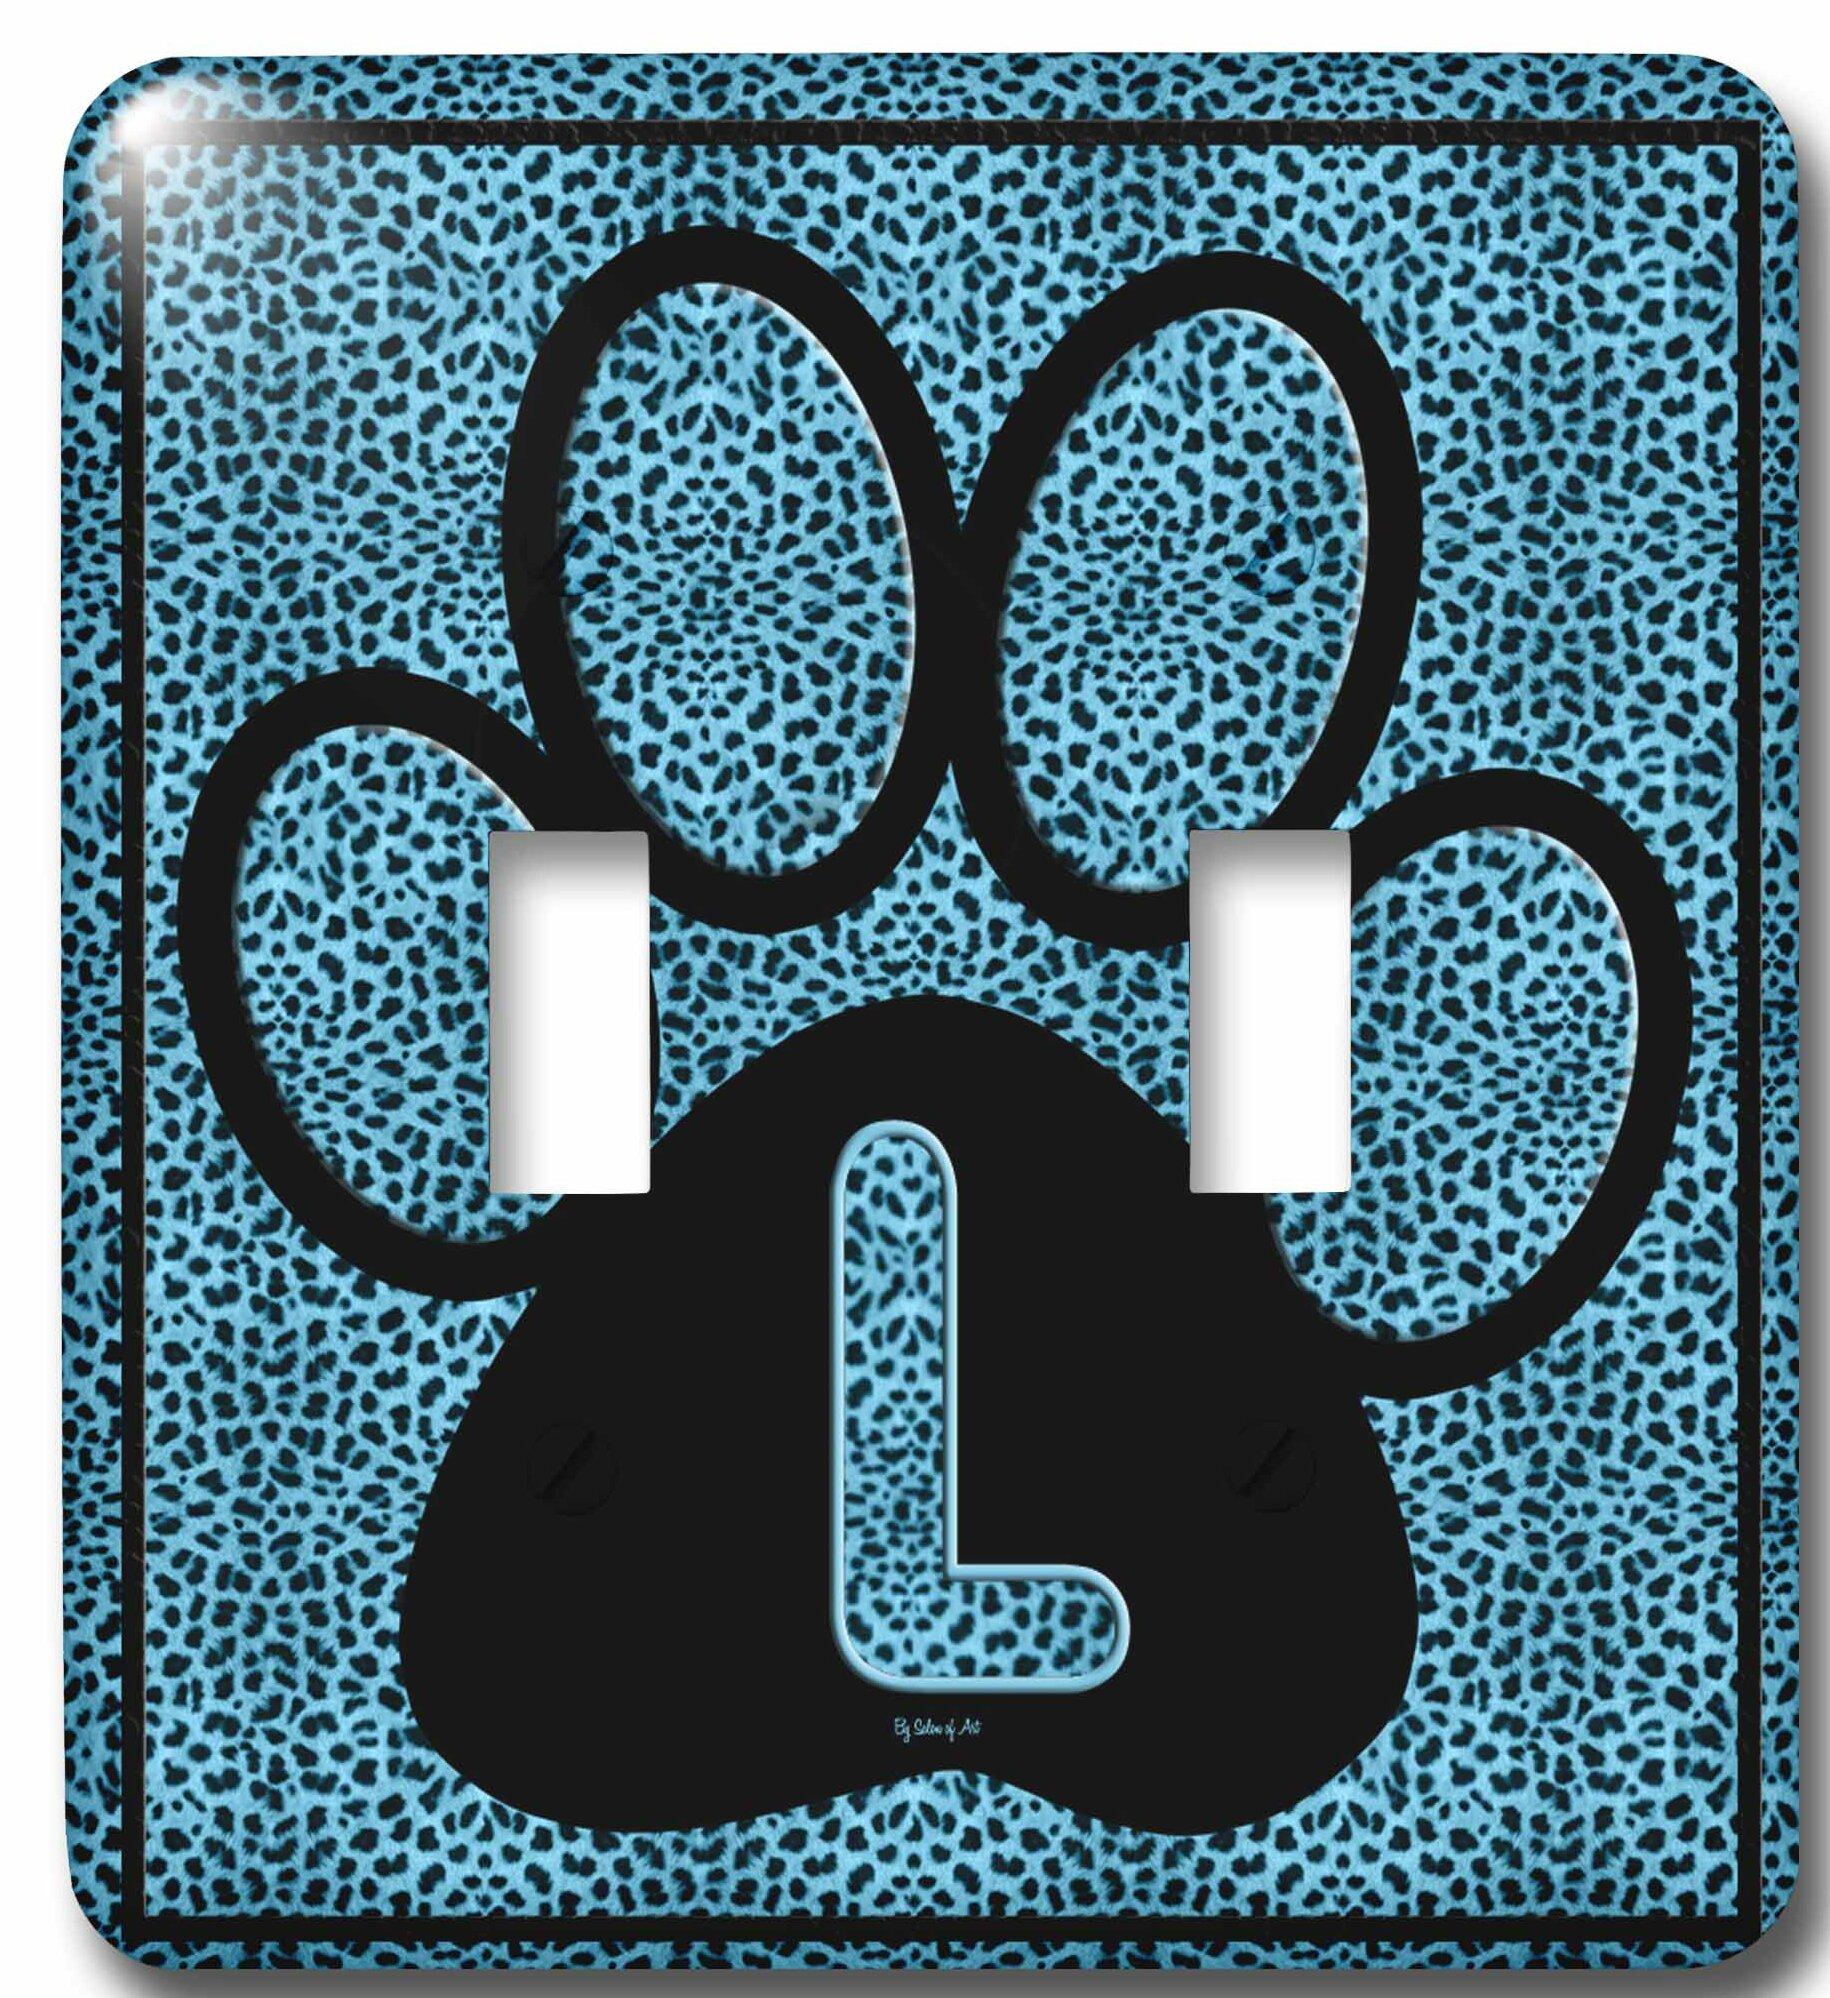 3drose Letter Cheetah Print Cat Paw 2 Gang Toggle Light Switch Wall Plate Wayfair